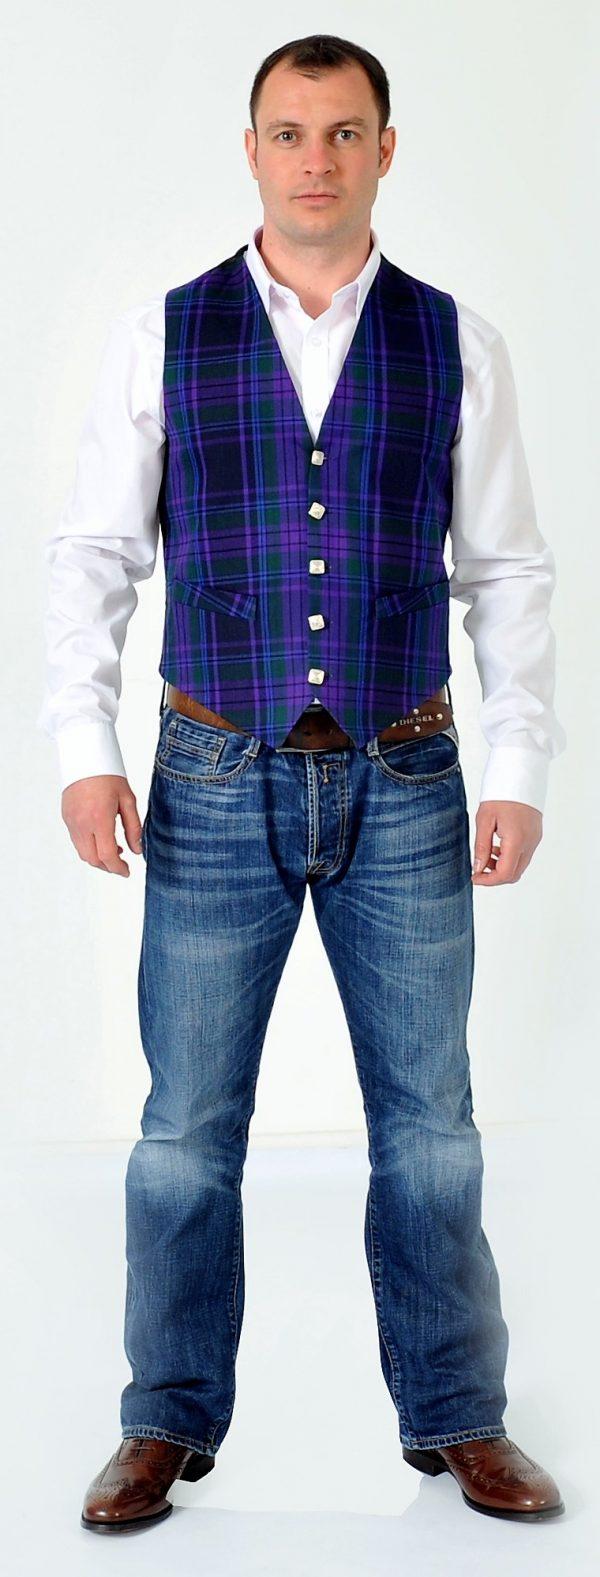 Spirit Of Scotland Tartan Waistcoat